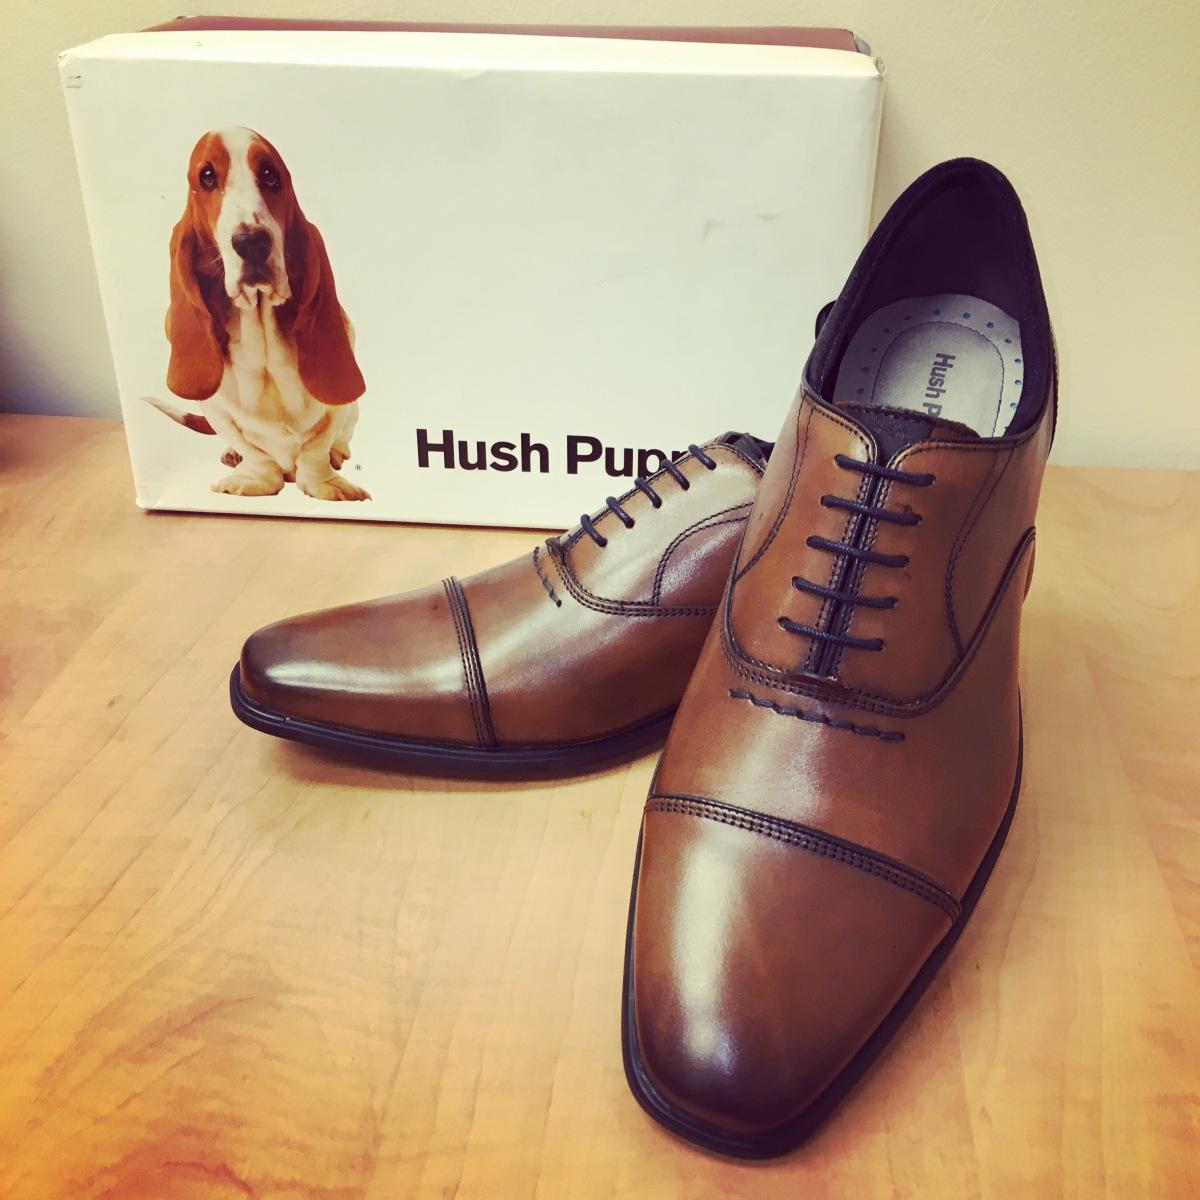 Hush Puppies - Evan Maddow